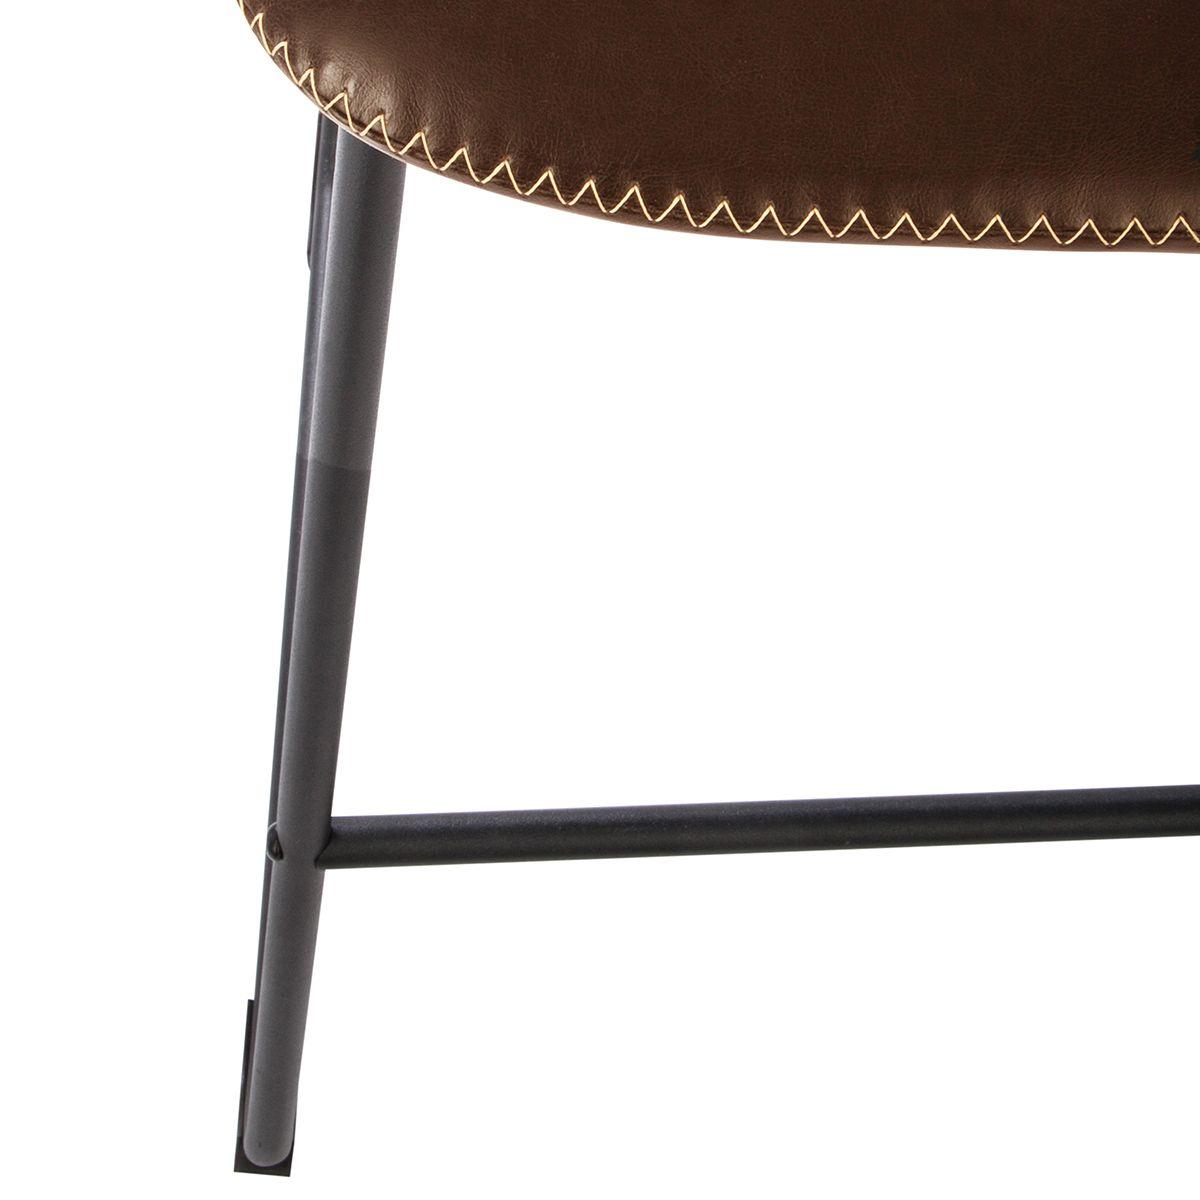 Chaise de bar confortable surpiqué marron